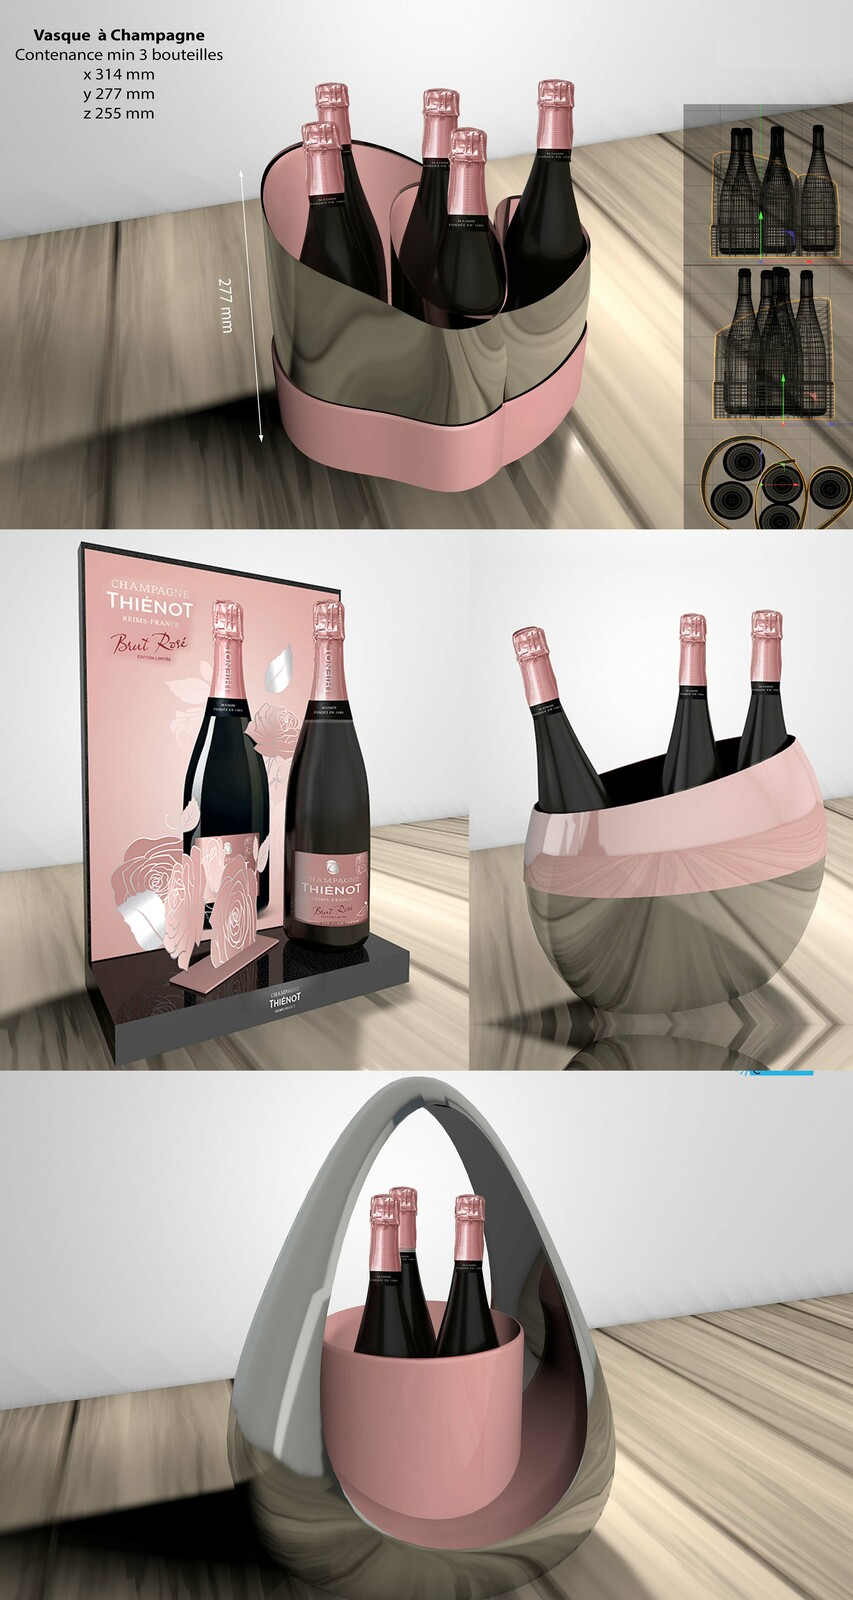 Prototype 3D design seau champagne & display